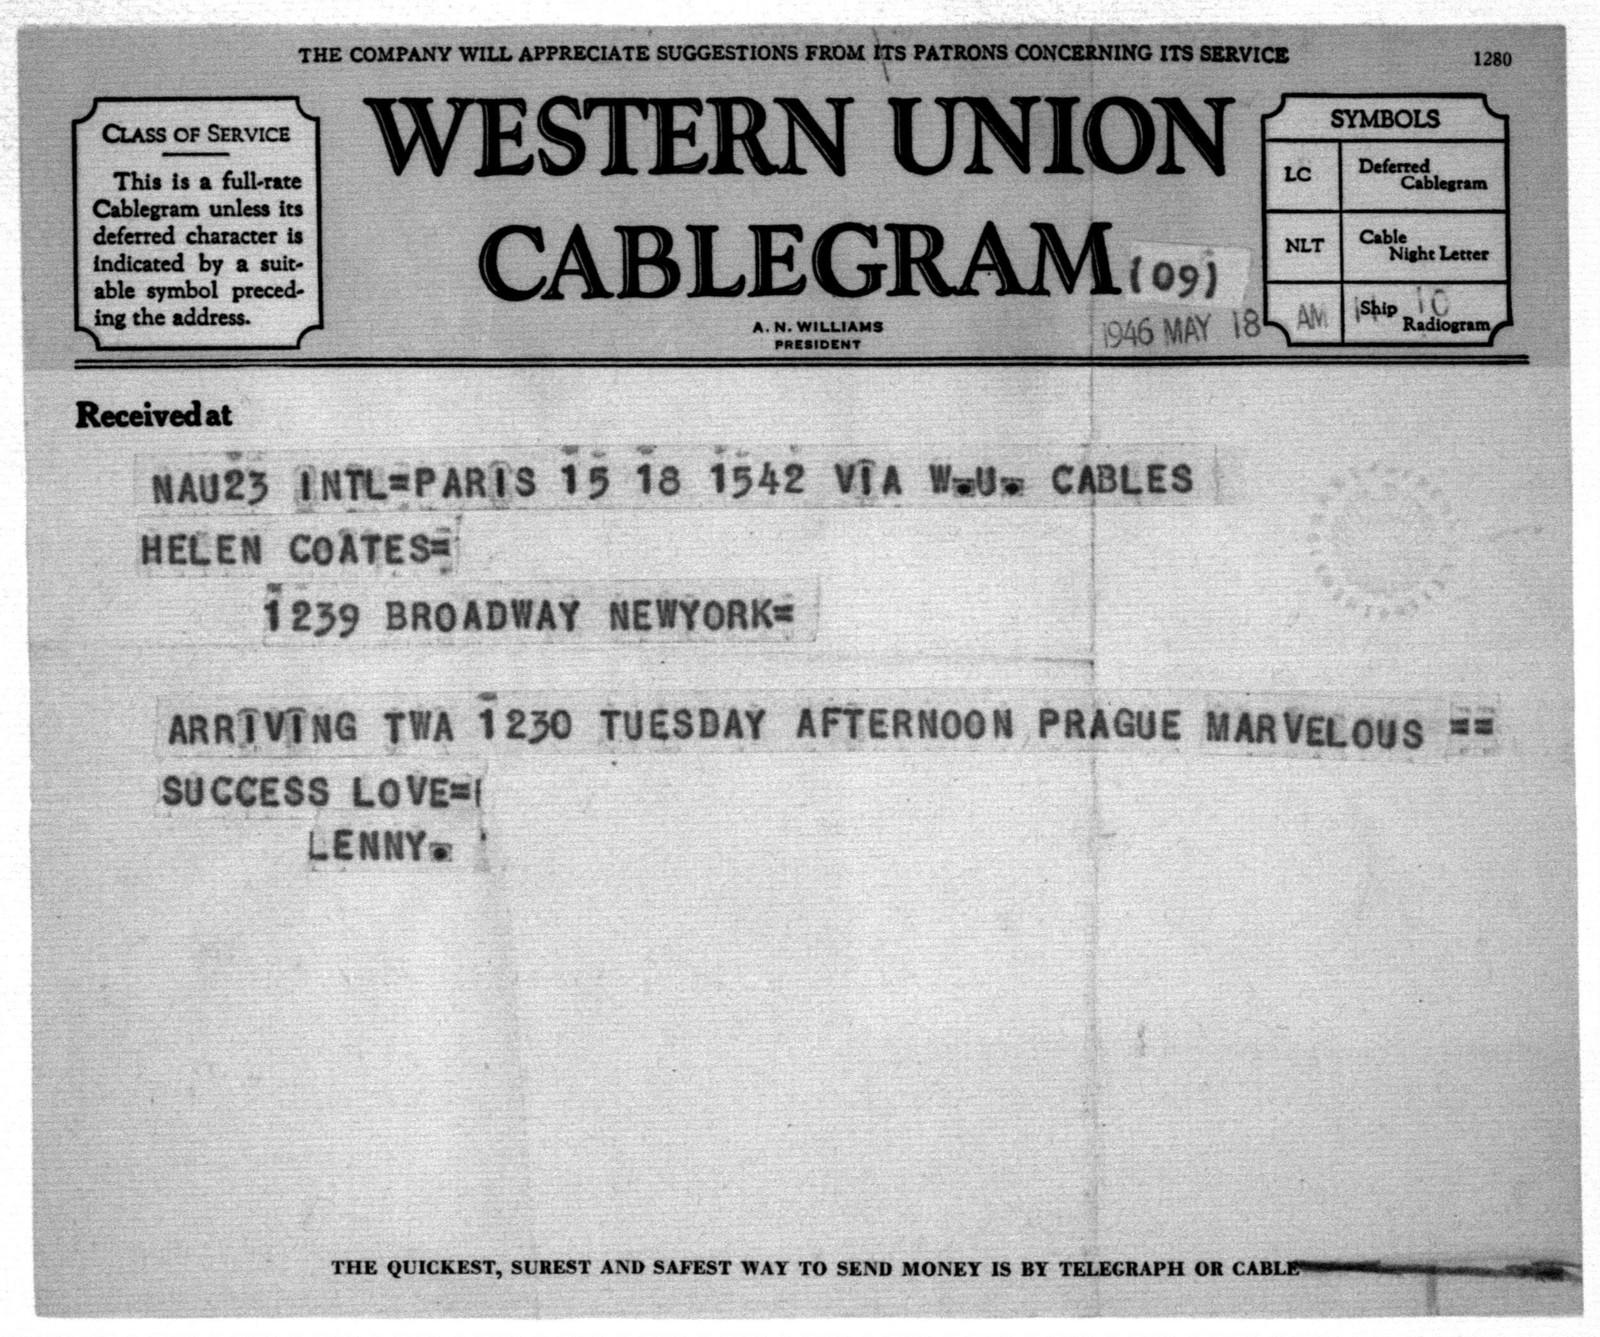 Letter from Leonard Bernstein to Helen Coates, May 18, 1946